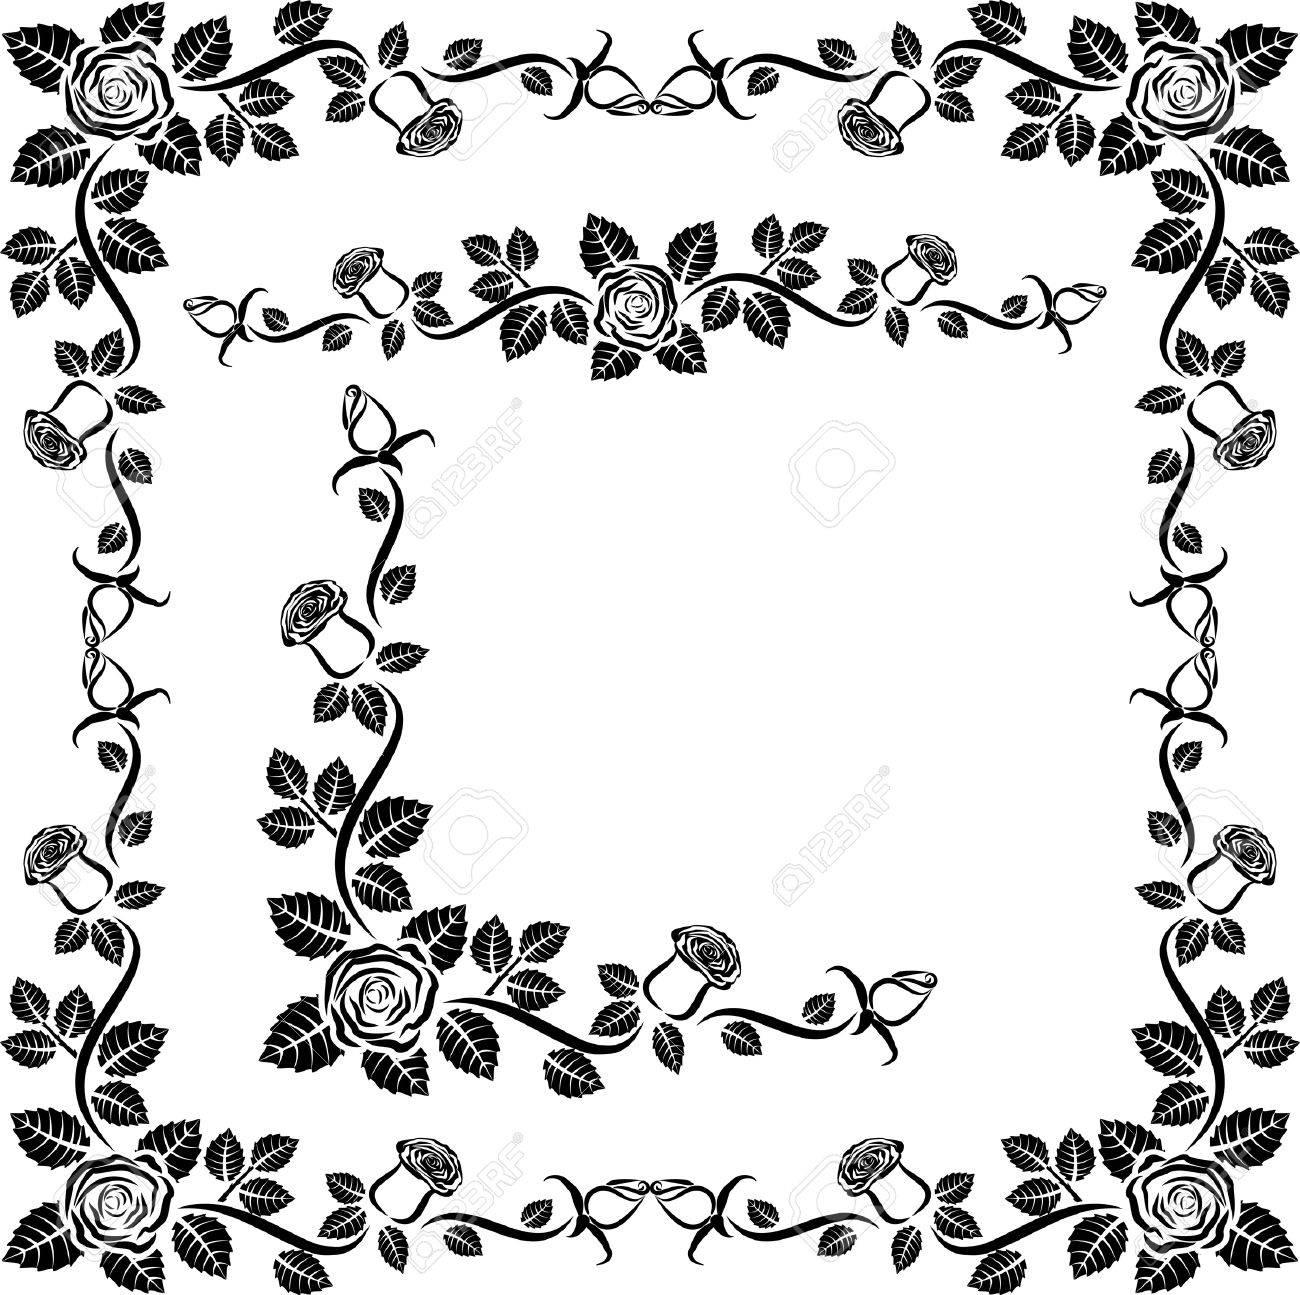 1300x1295 Gaeroladid White Rose Border Clip Art Images